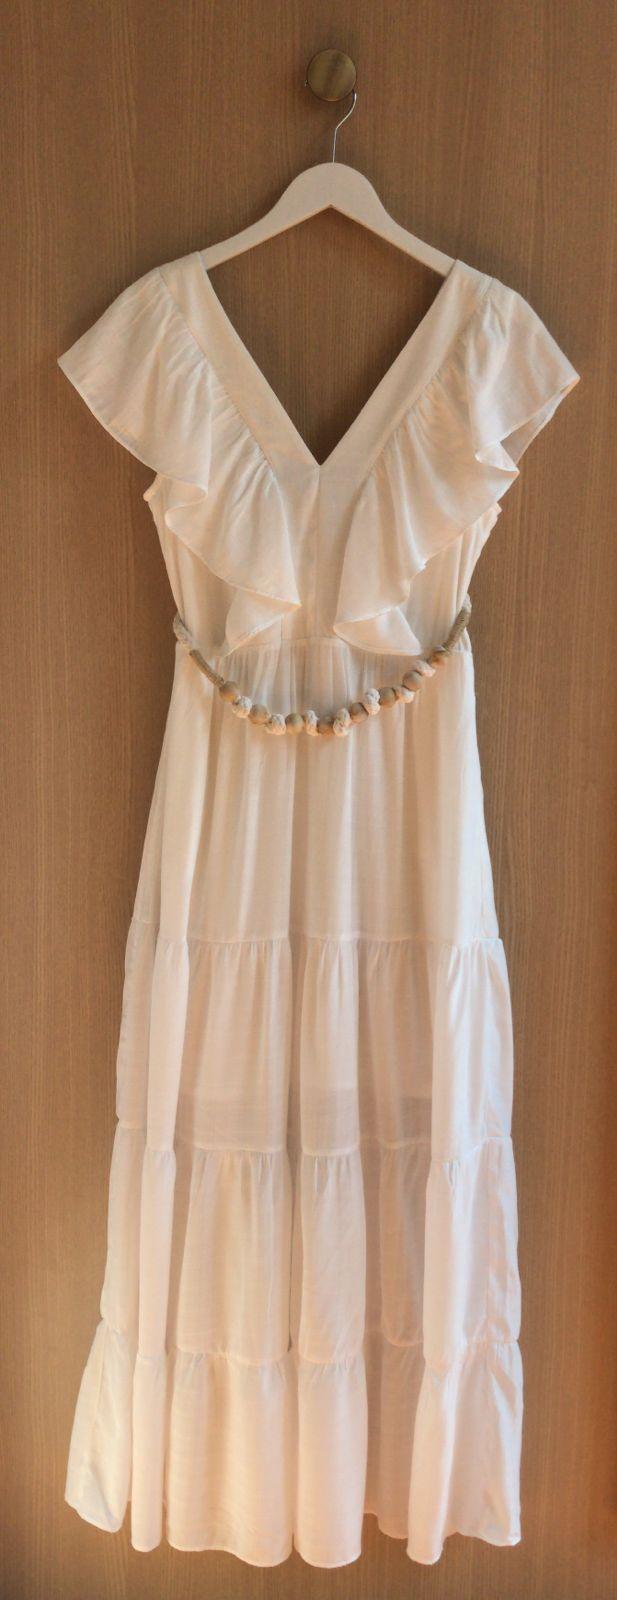 Vestido Clemence Viscocrepe (Forro) Detakhe Babados + Cinto Corda